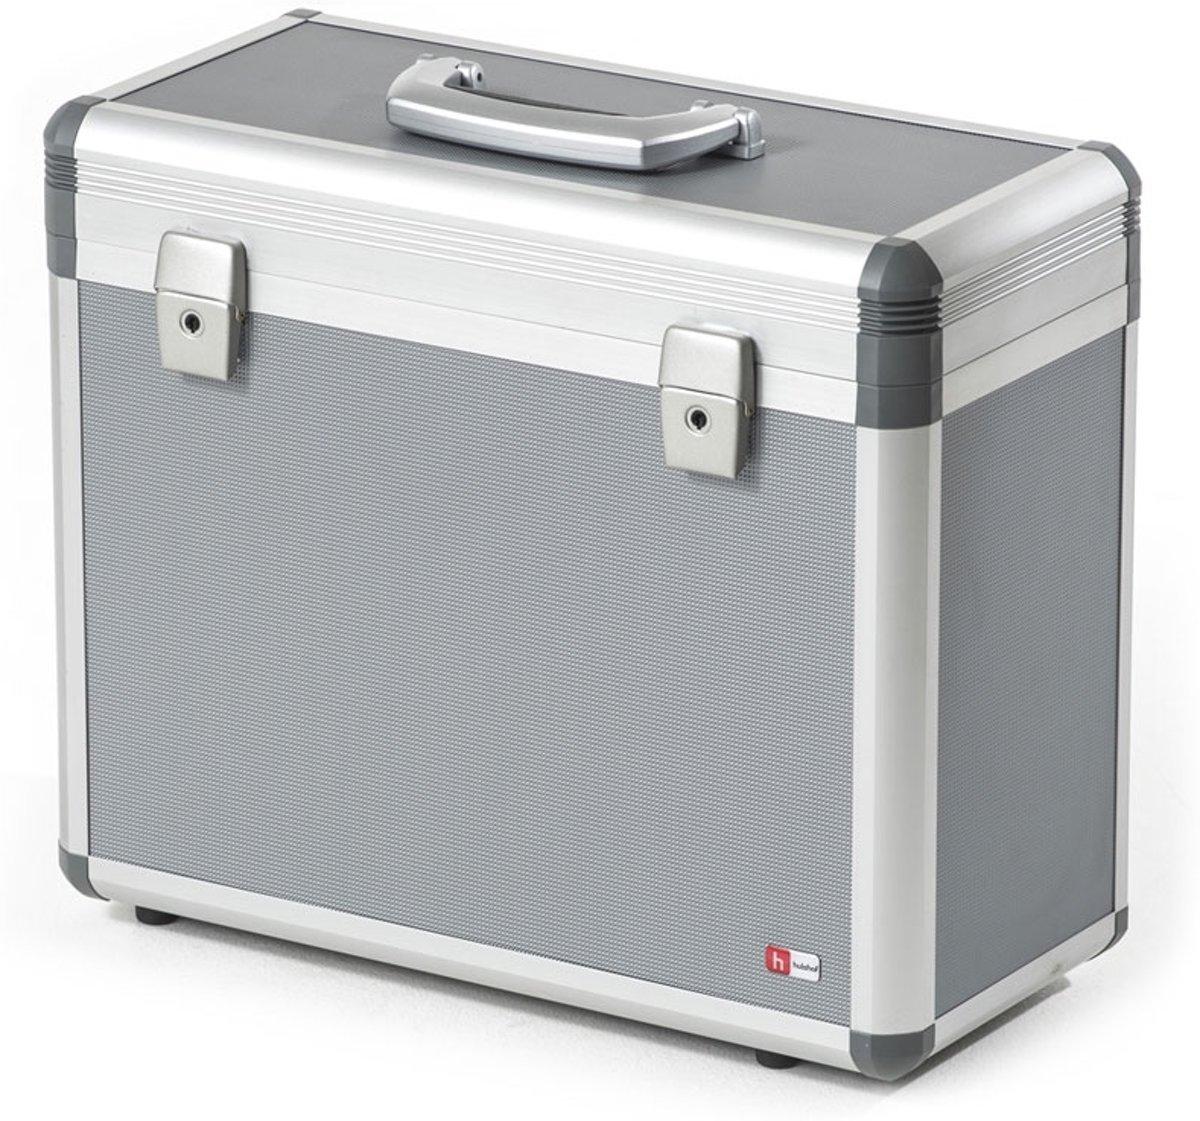 Hulshof Projector/Beamer Koffer Basic, Stevige transportkoffer voor beamer of projector en laptop, inclusief verdeelschot en bufferingen kopen